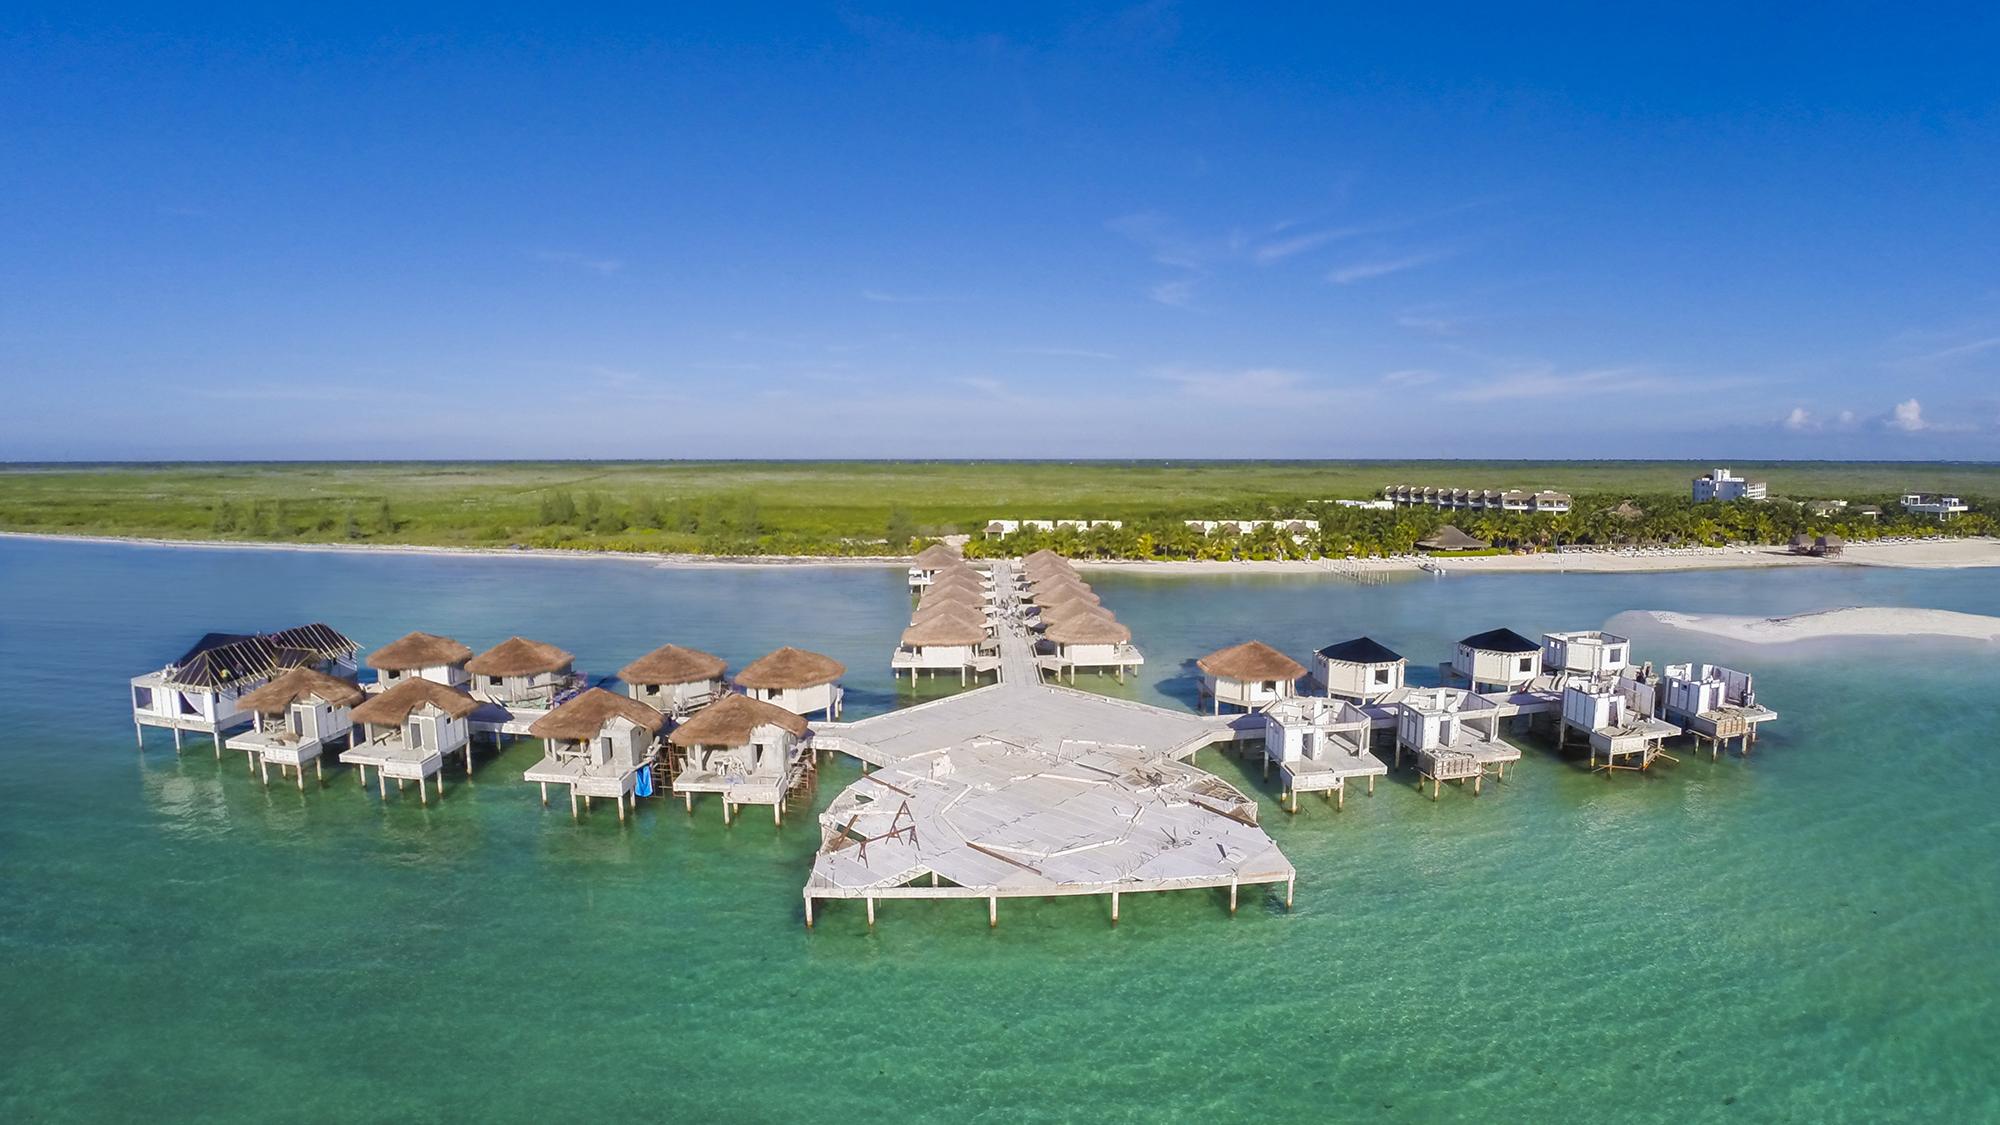 Drone Image Capturing Construction On The Palafitos Overwater Bungalows At El Dorado Maroma A